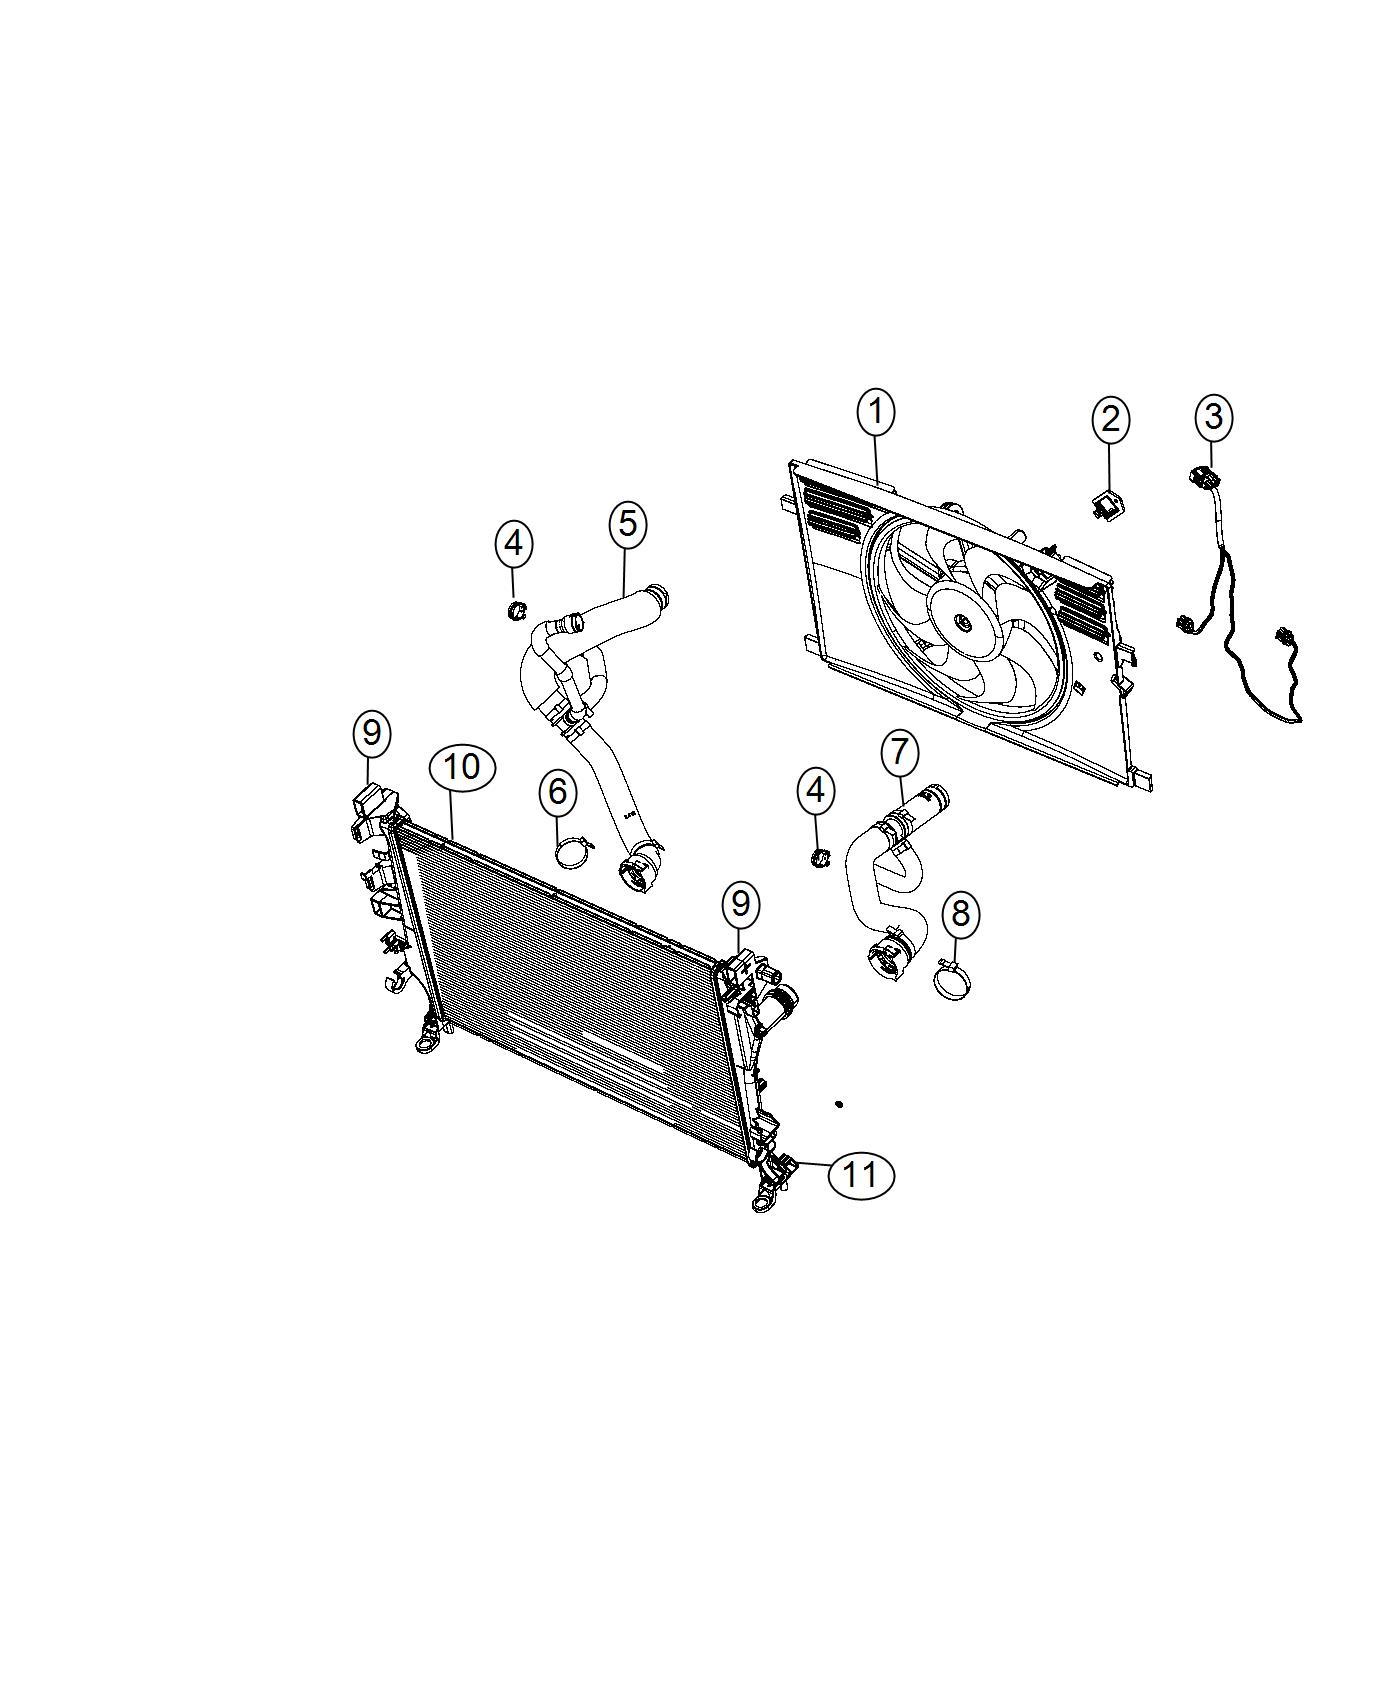 2016 Jeep Resistor. Radiator fan. Export. [air